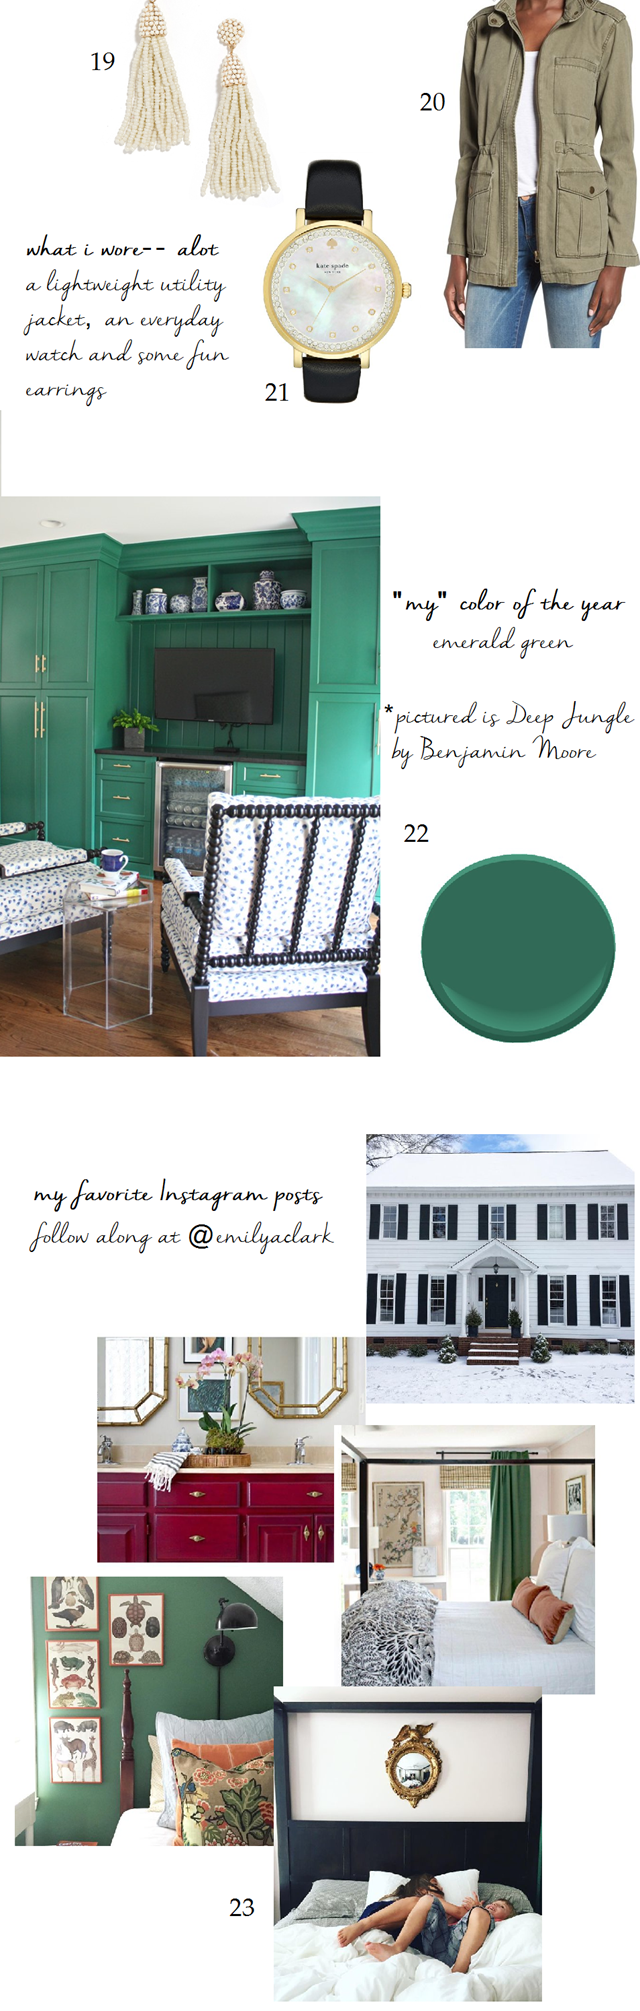 2016 favorite things fashion color IG